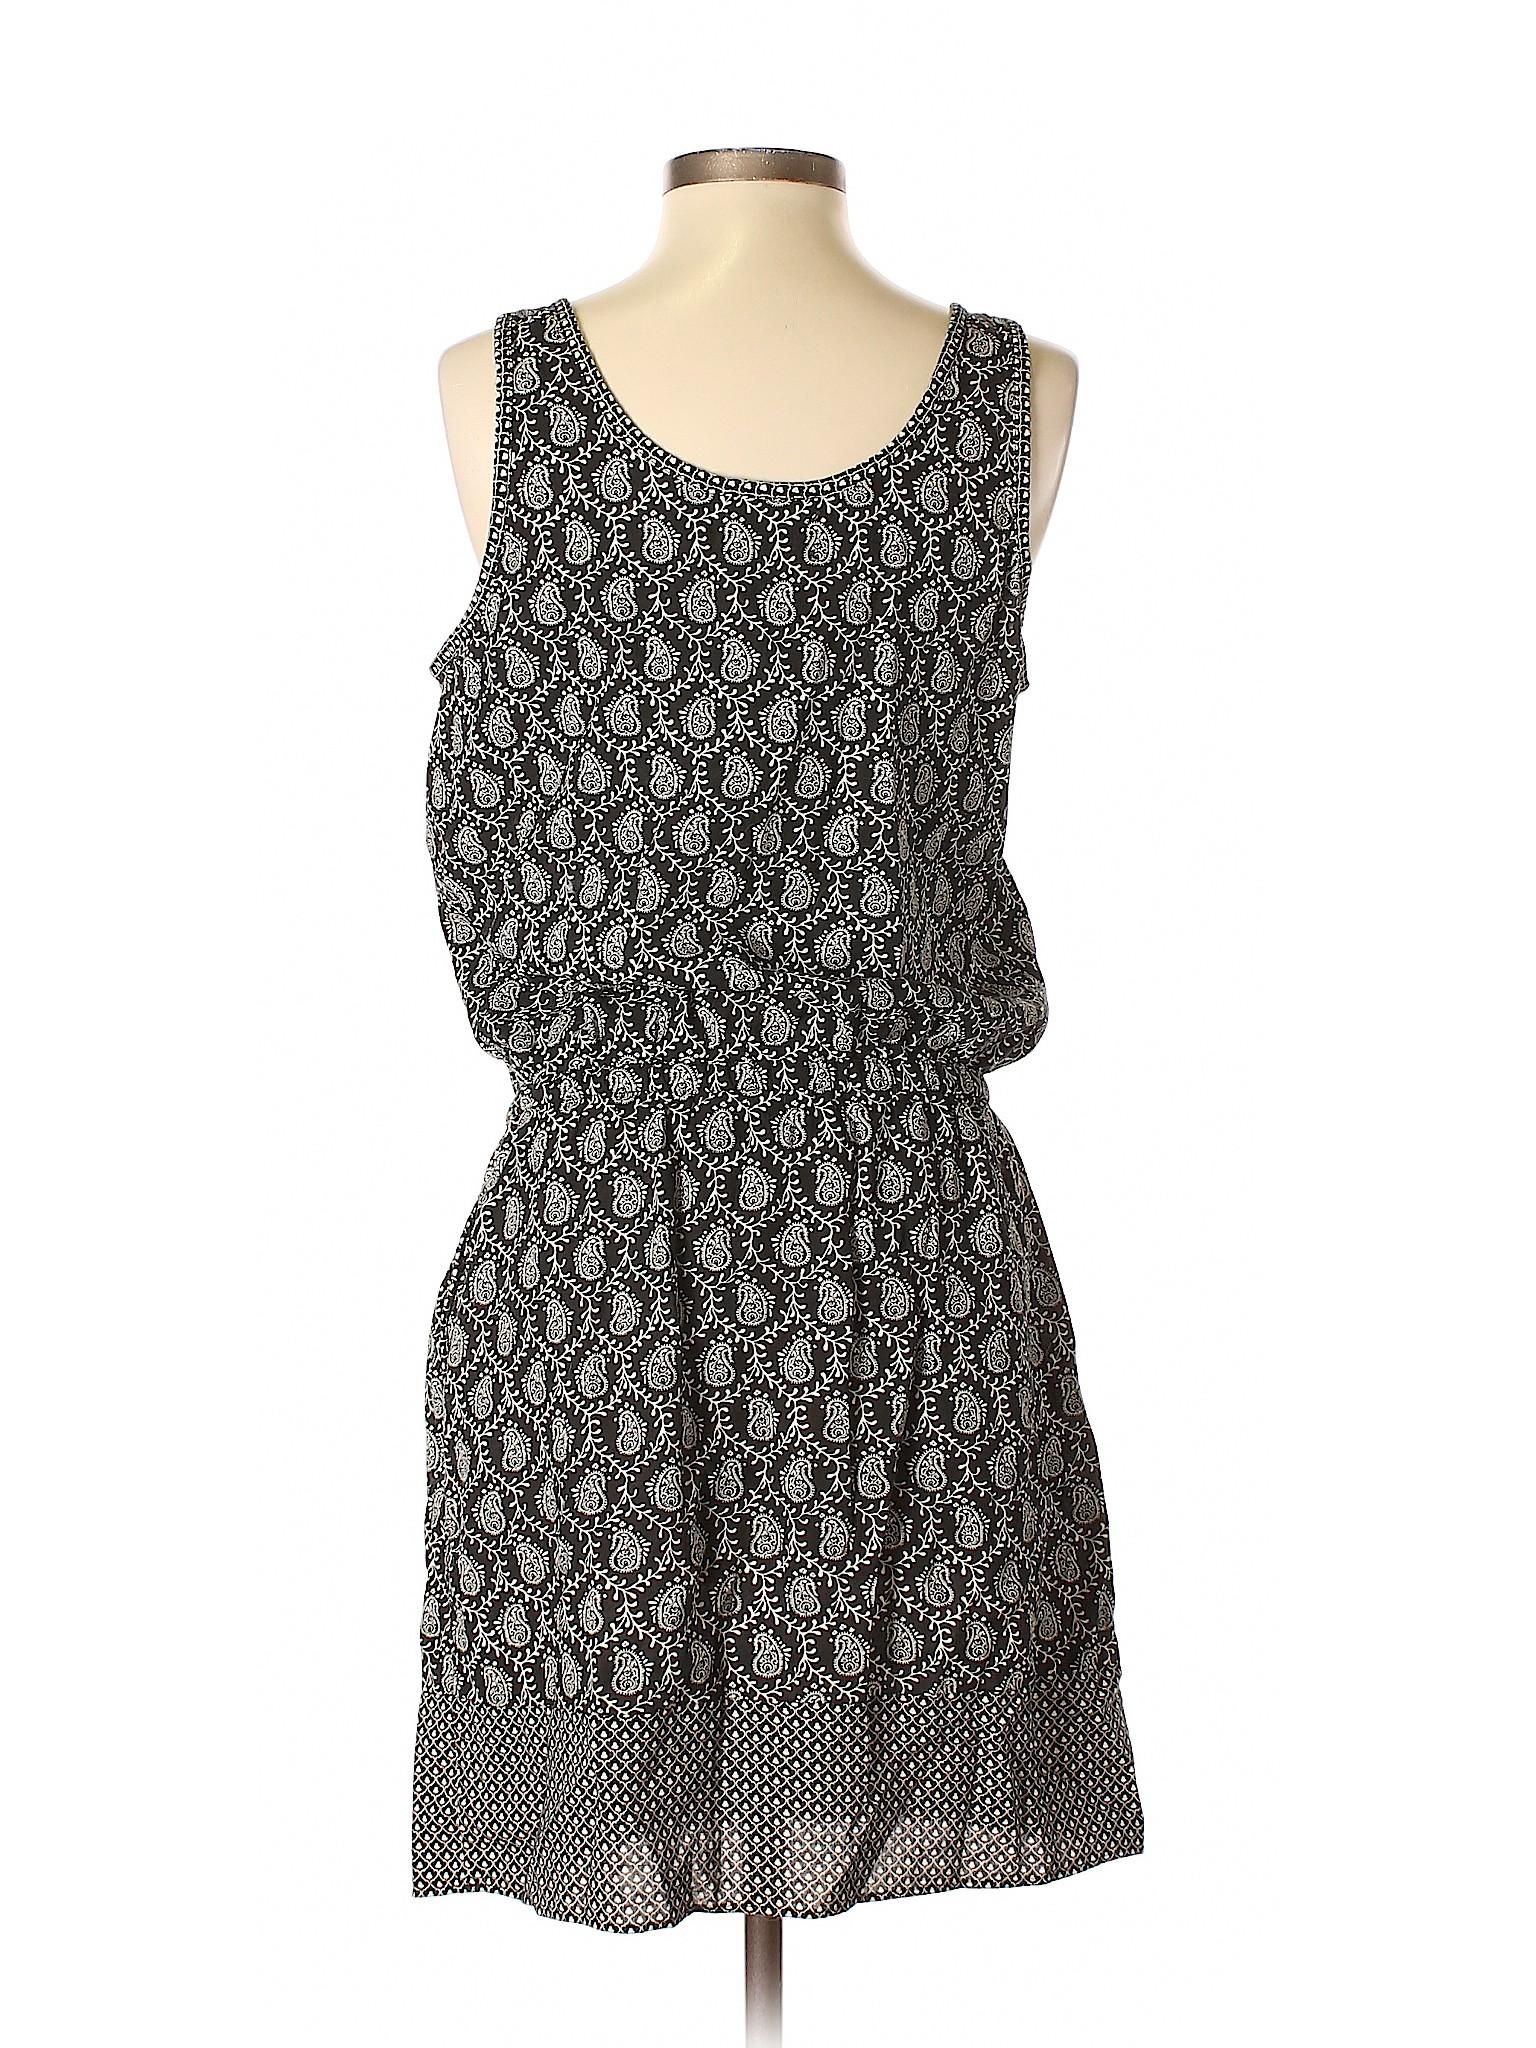 winter Casual Dress amp; Boutique Lou Grey 6w1qFFPd